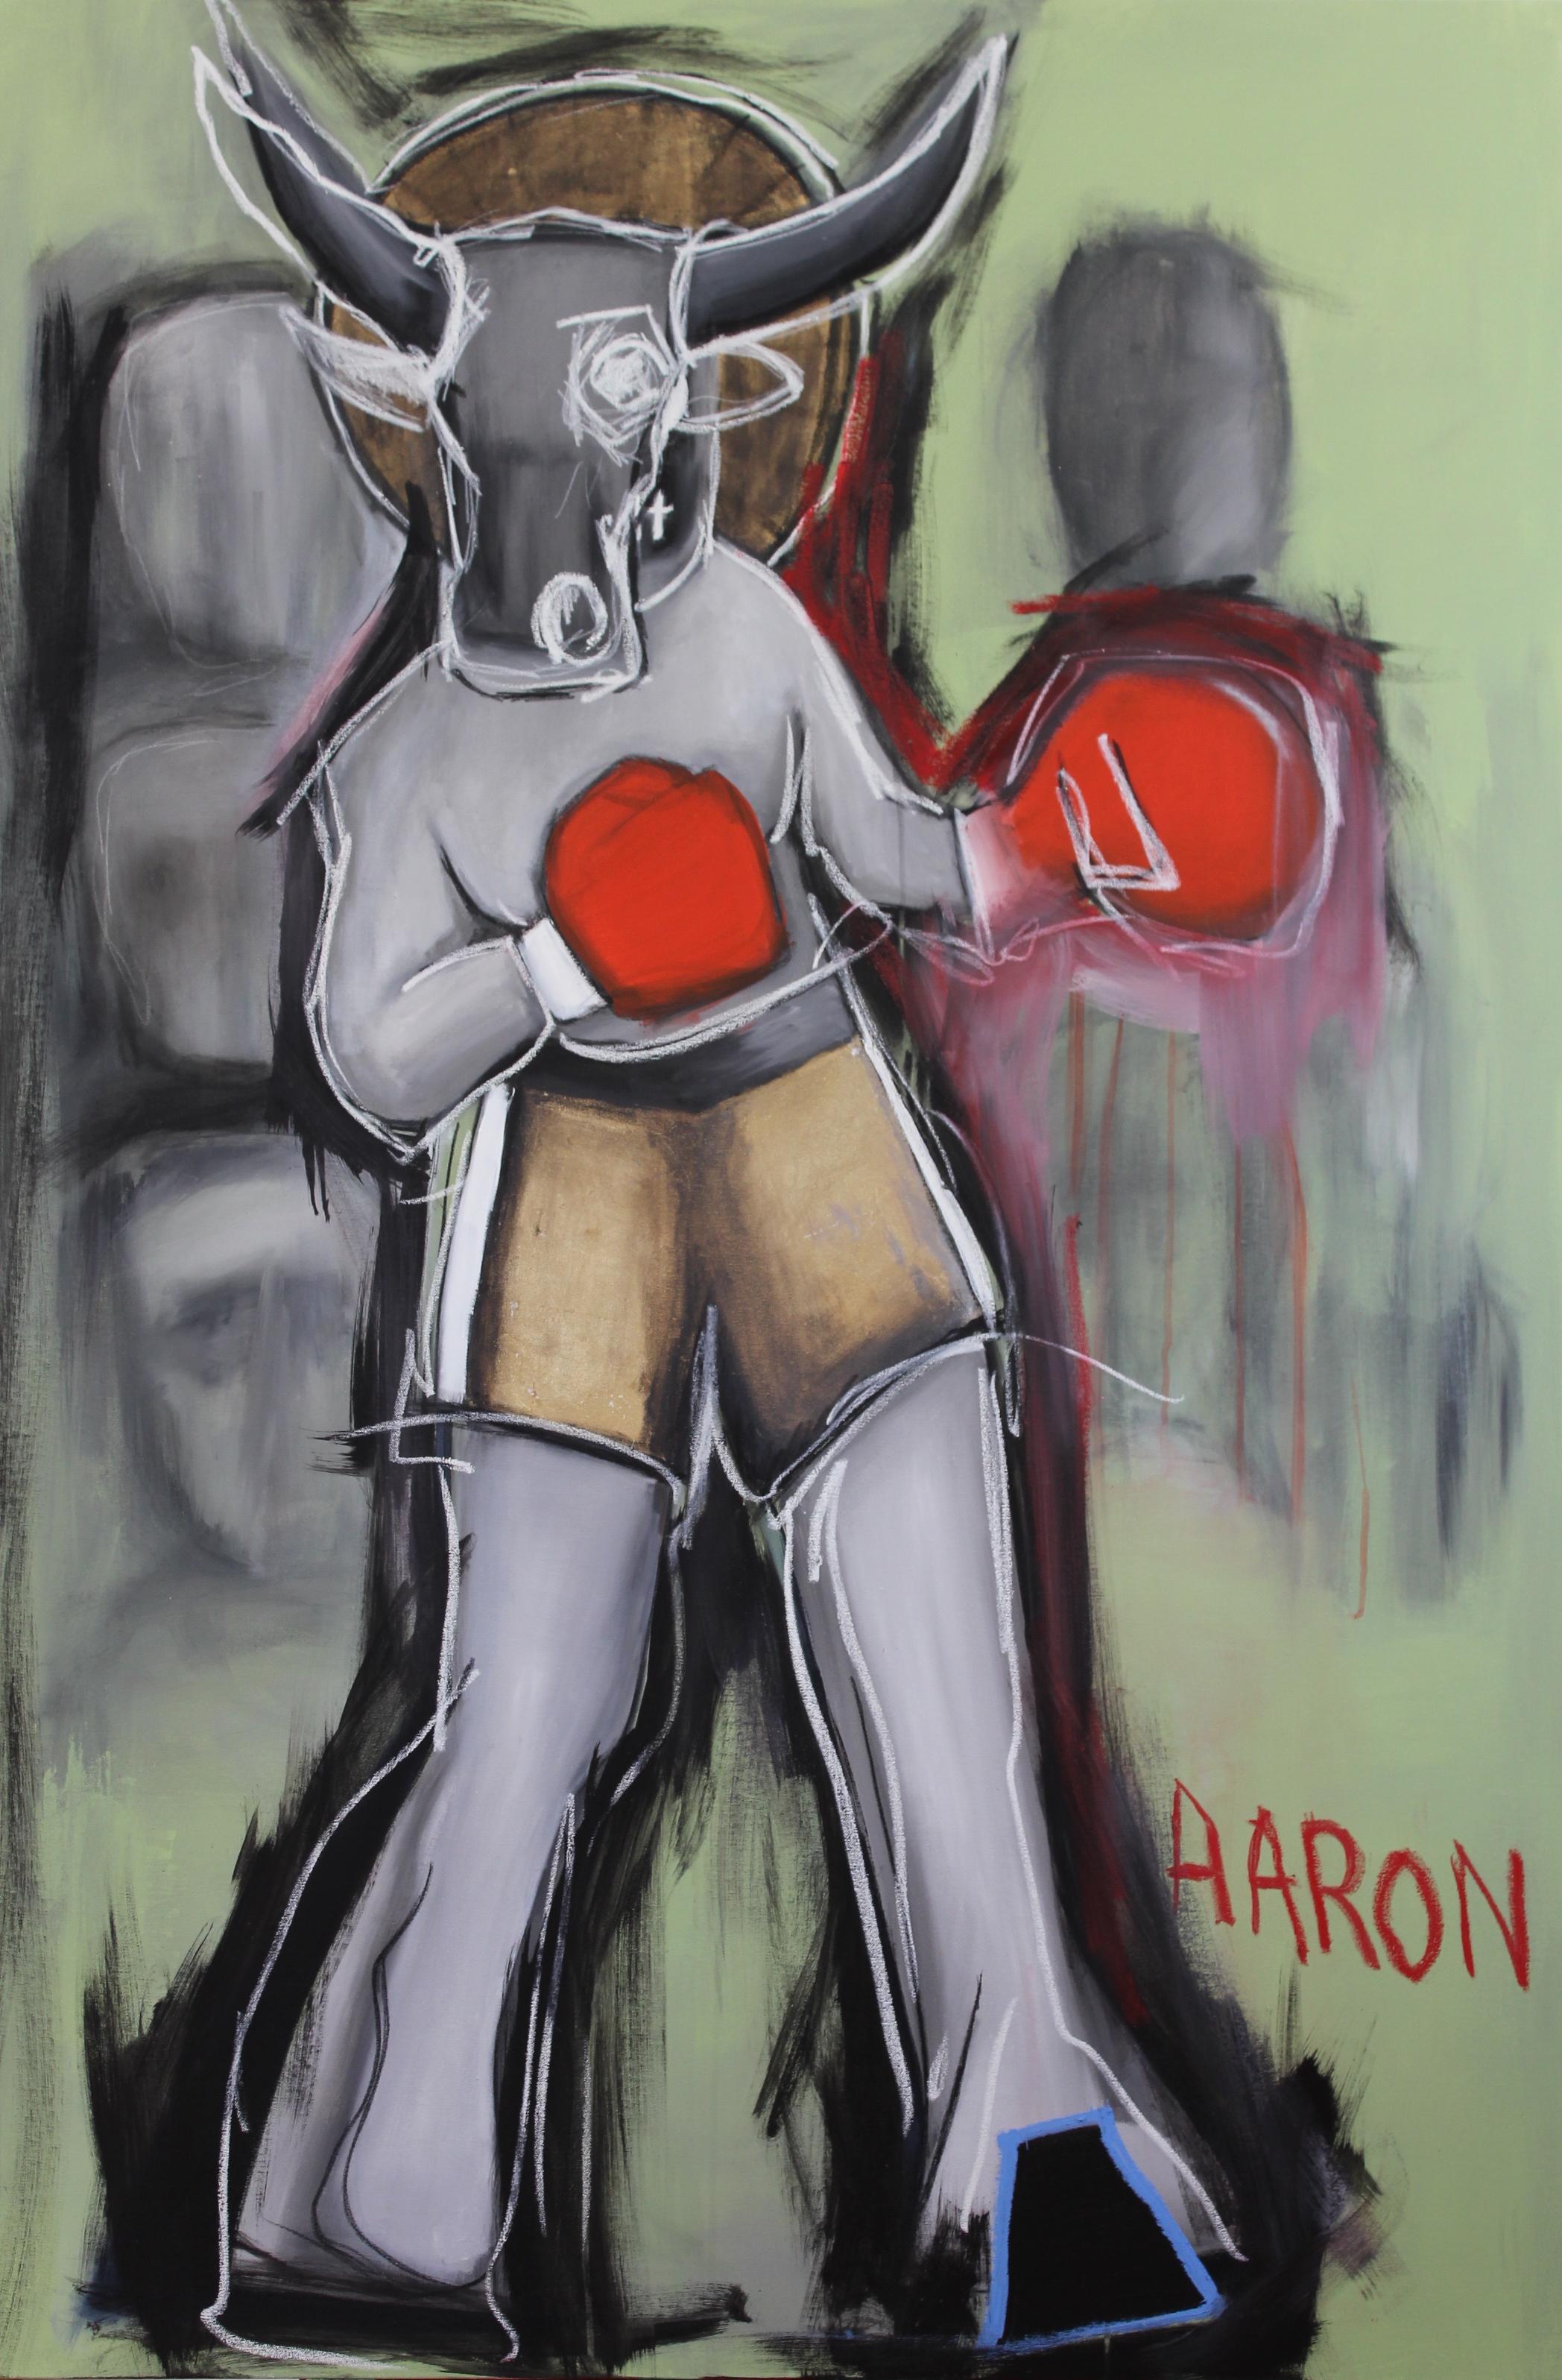 Aaron 2016